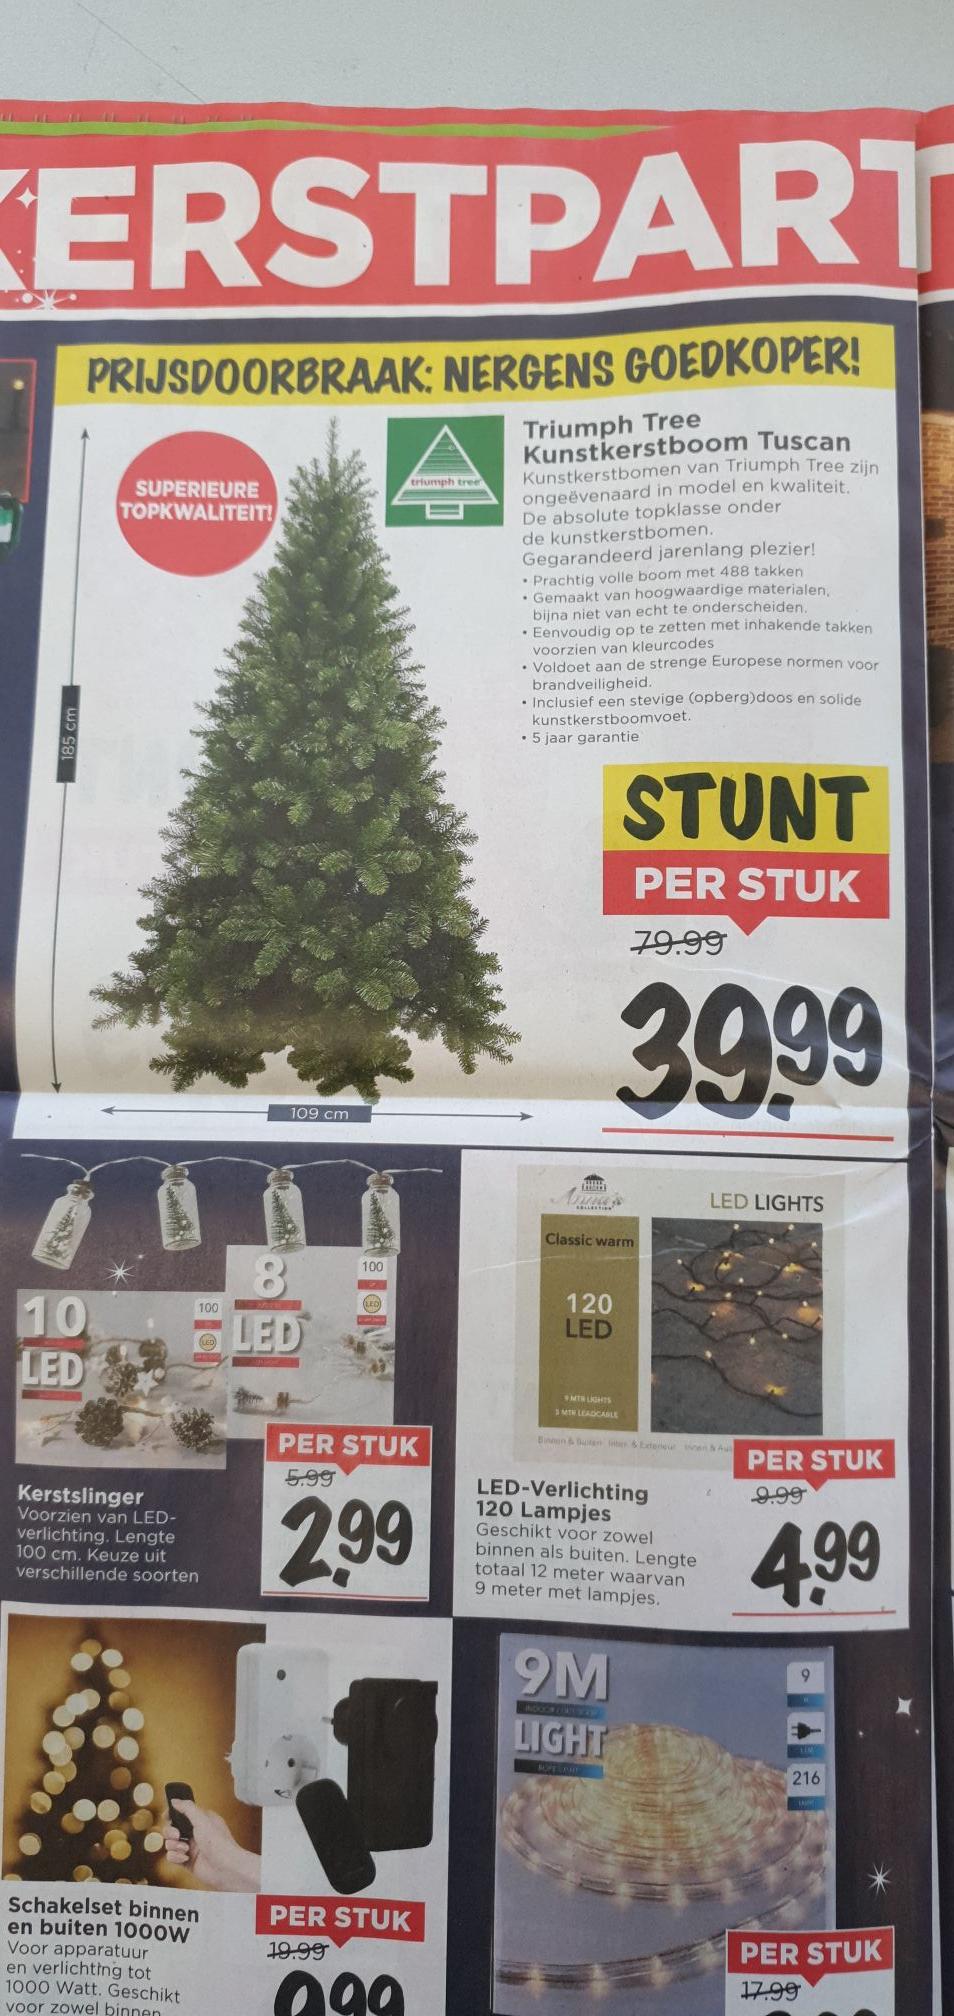 Superaanbieding Vomar: Triumph Tree kunst kerstboom 39,99 (ipv 75euro)